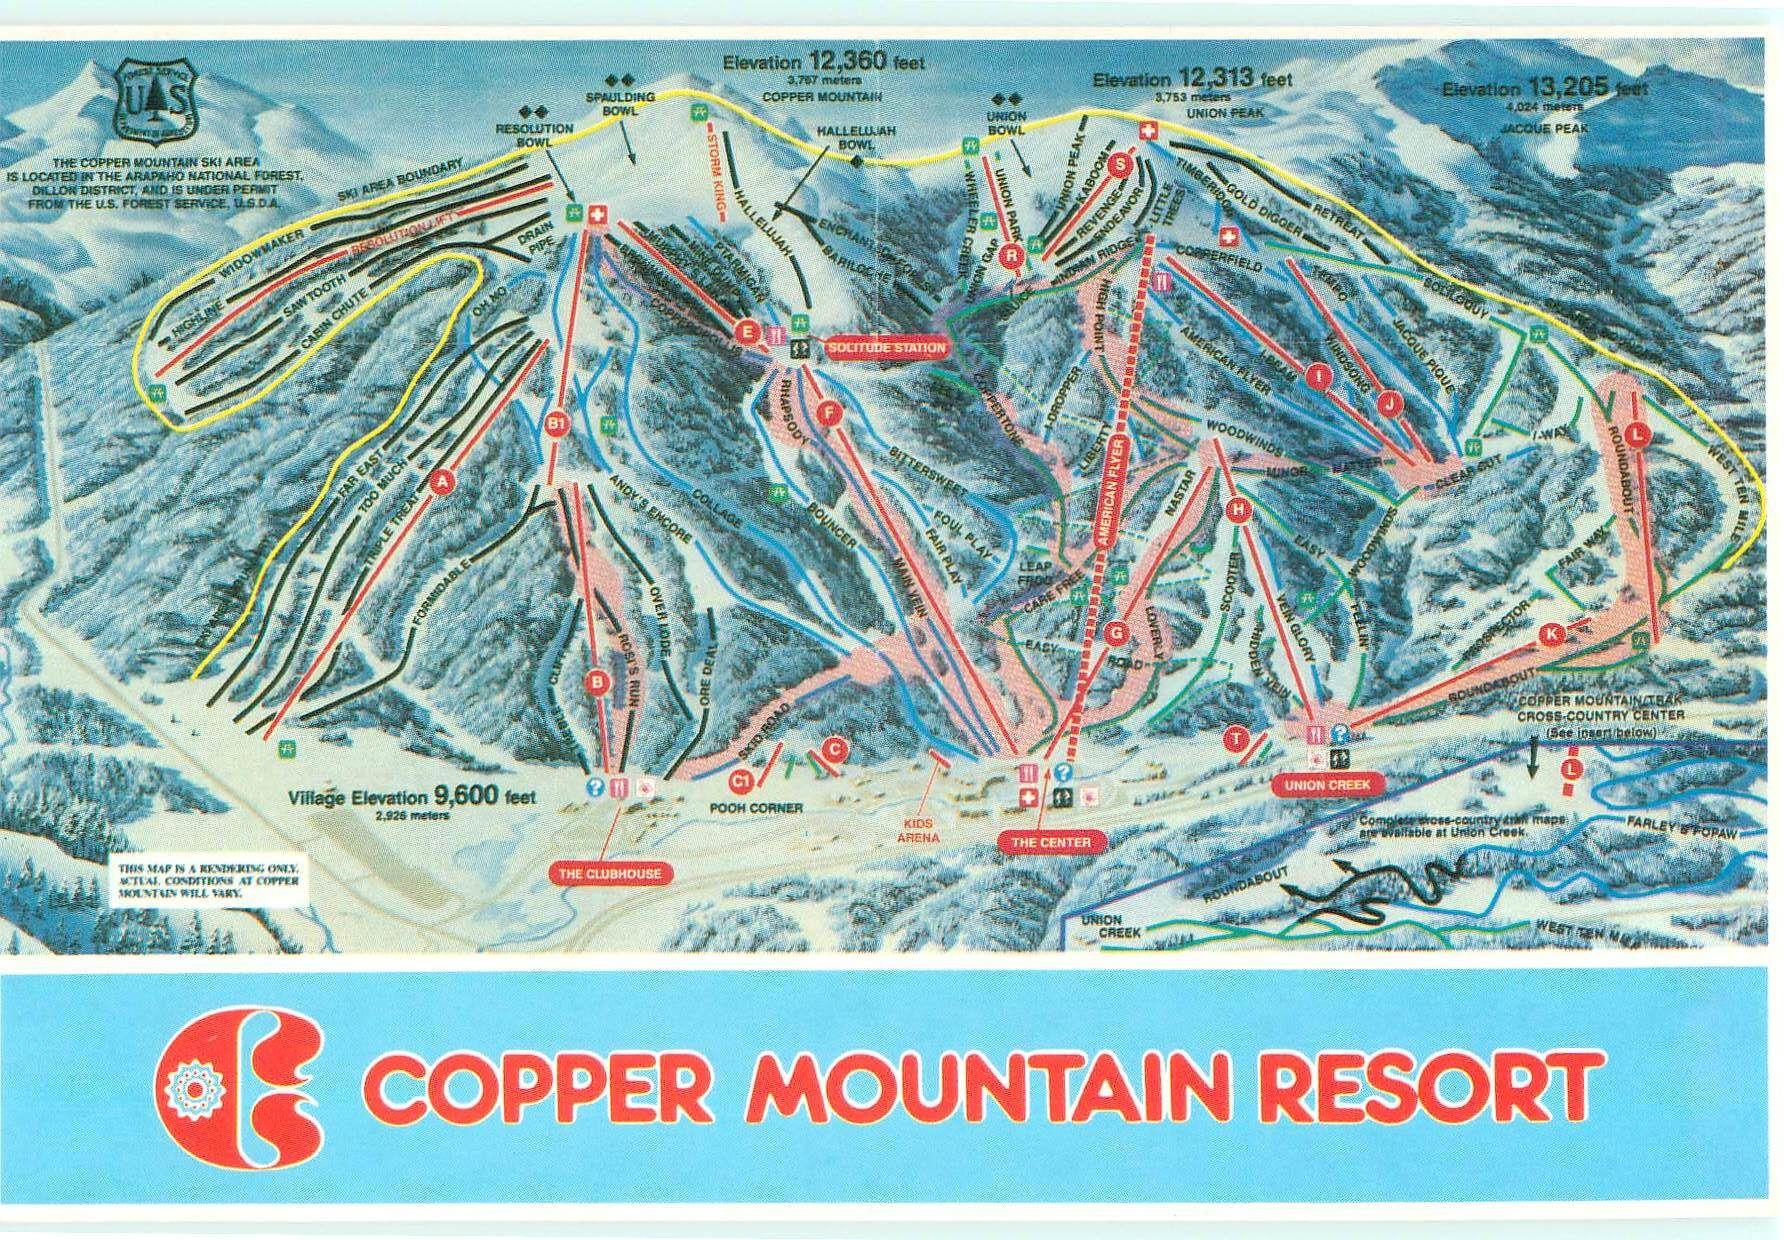 Copper Mountain Resort Trail Map Copper Mountain Copper Mountain Ski Copper Mountain Resort